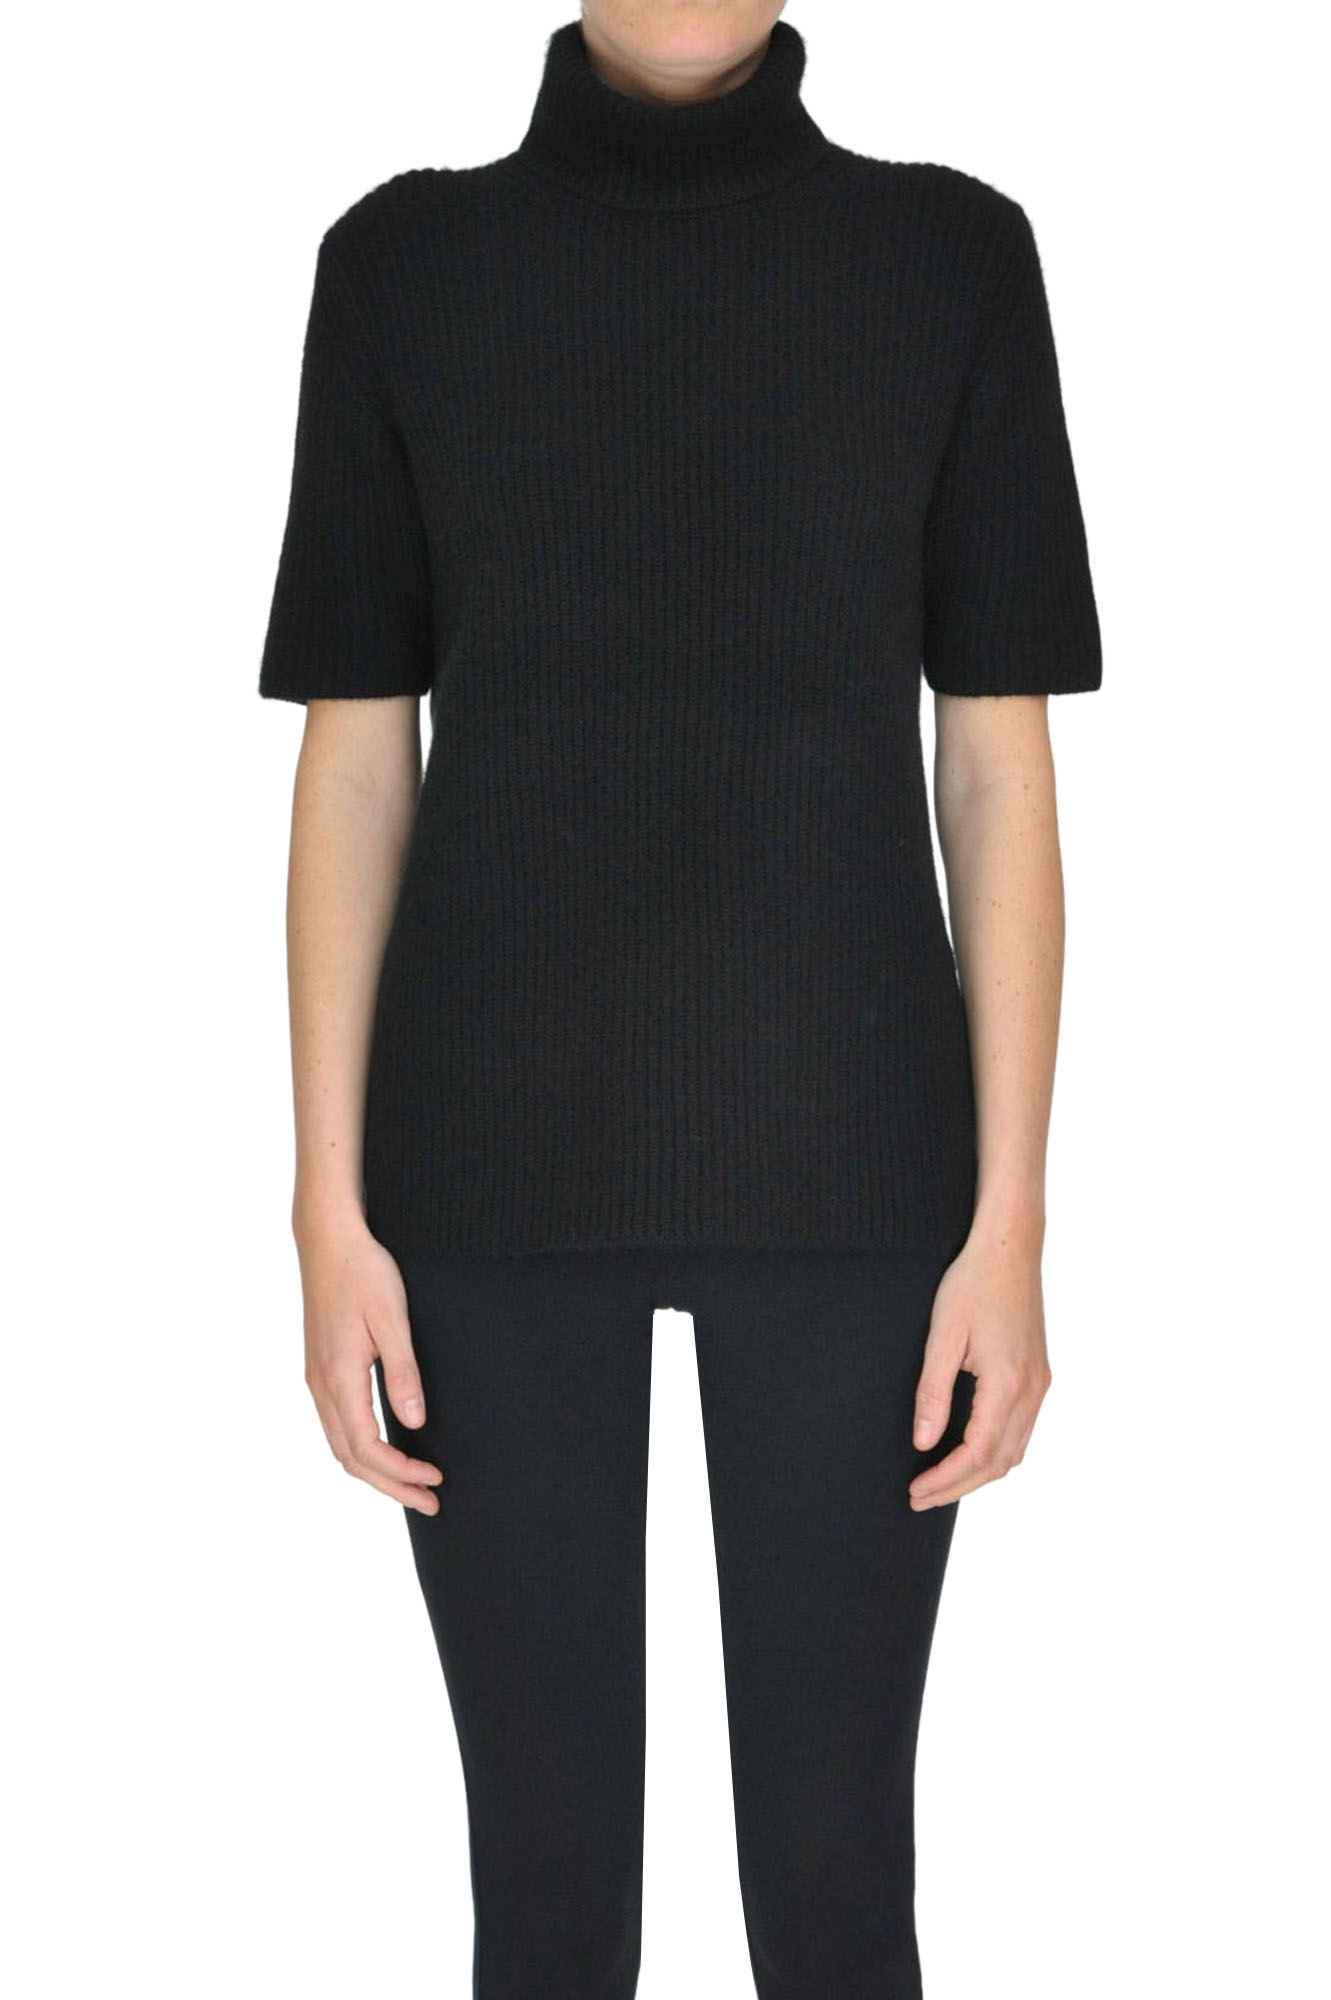 ALYKI Turtleneck Cashmere Pullover in Black